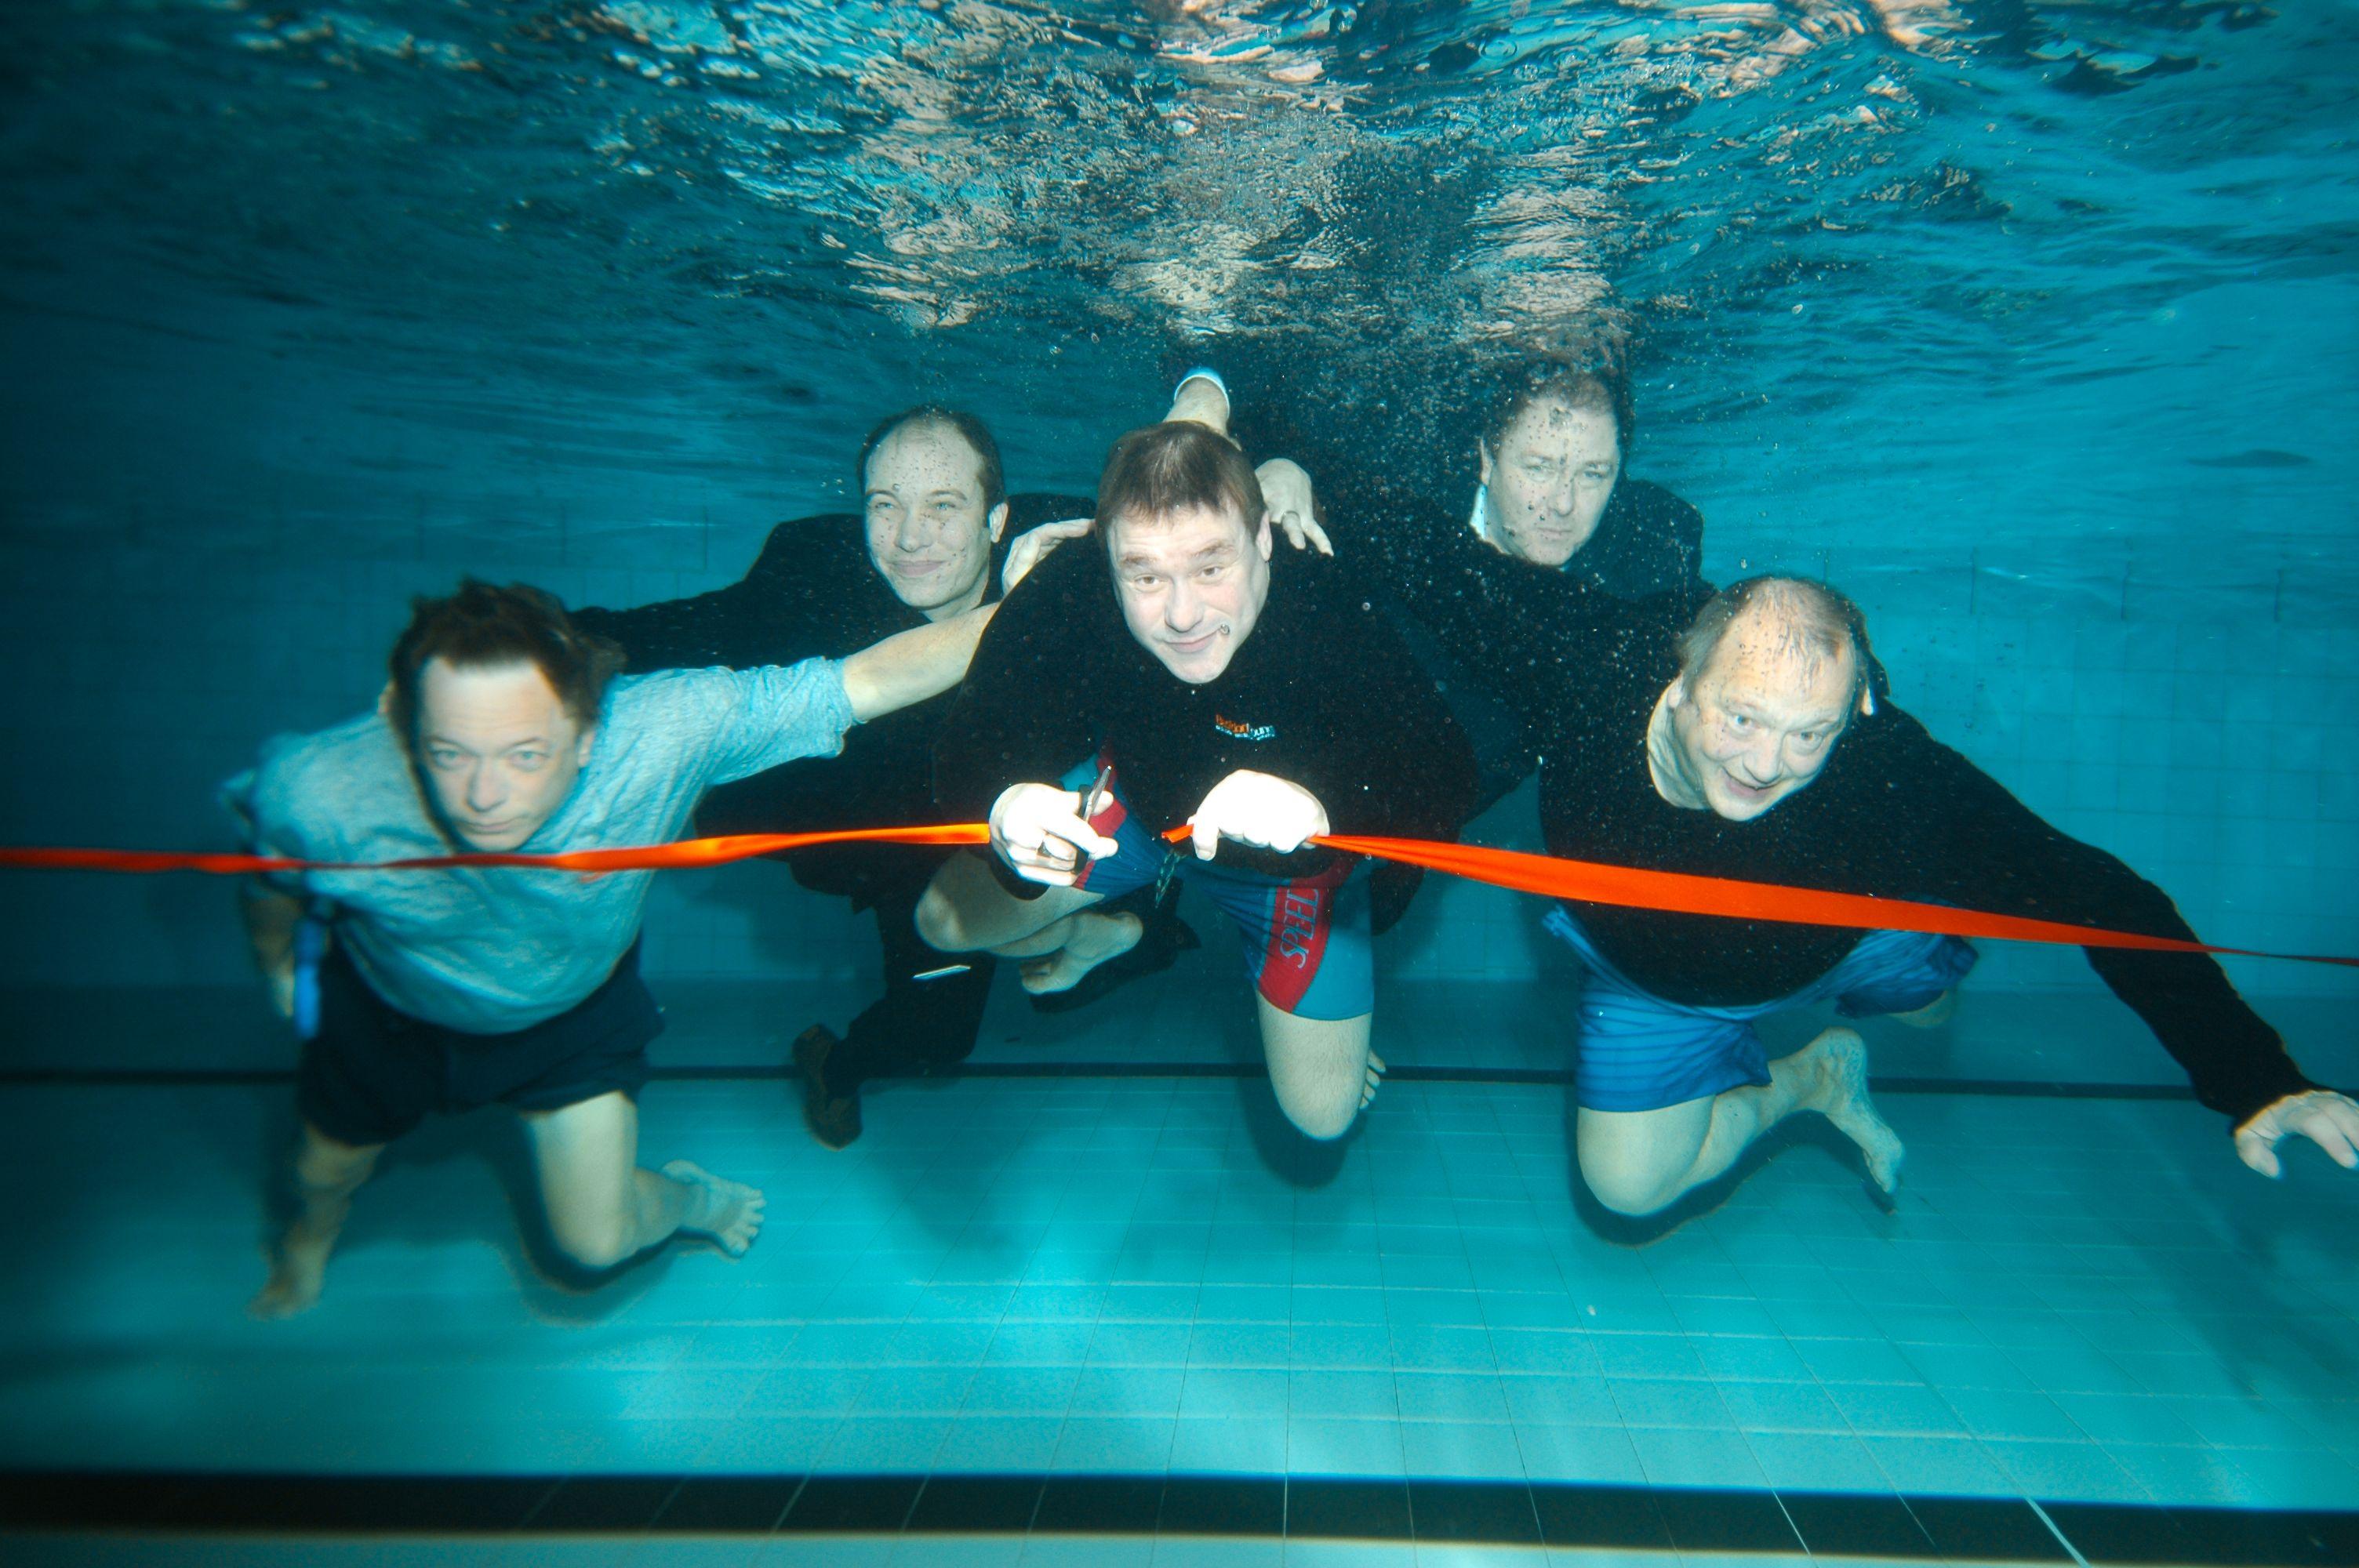 Basildon Council Splashing Time At Launch Of Refurbished Wickford Swimming Pool